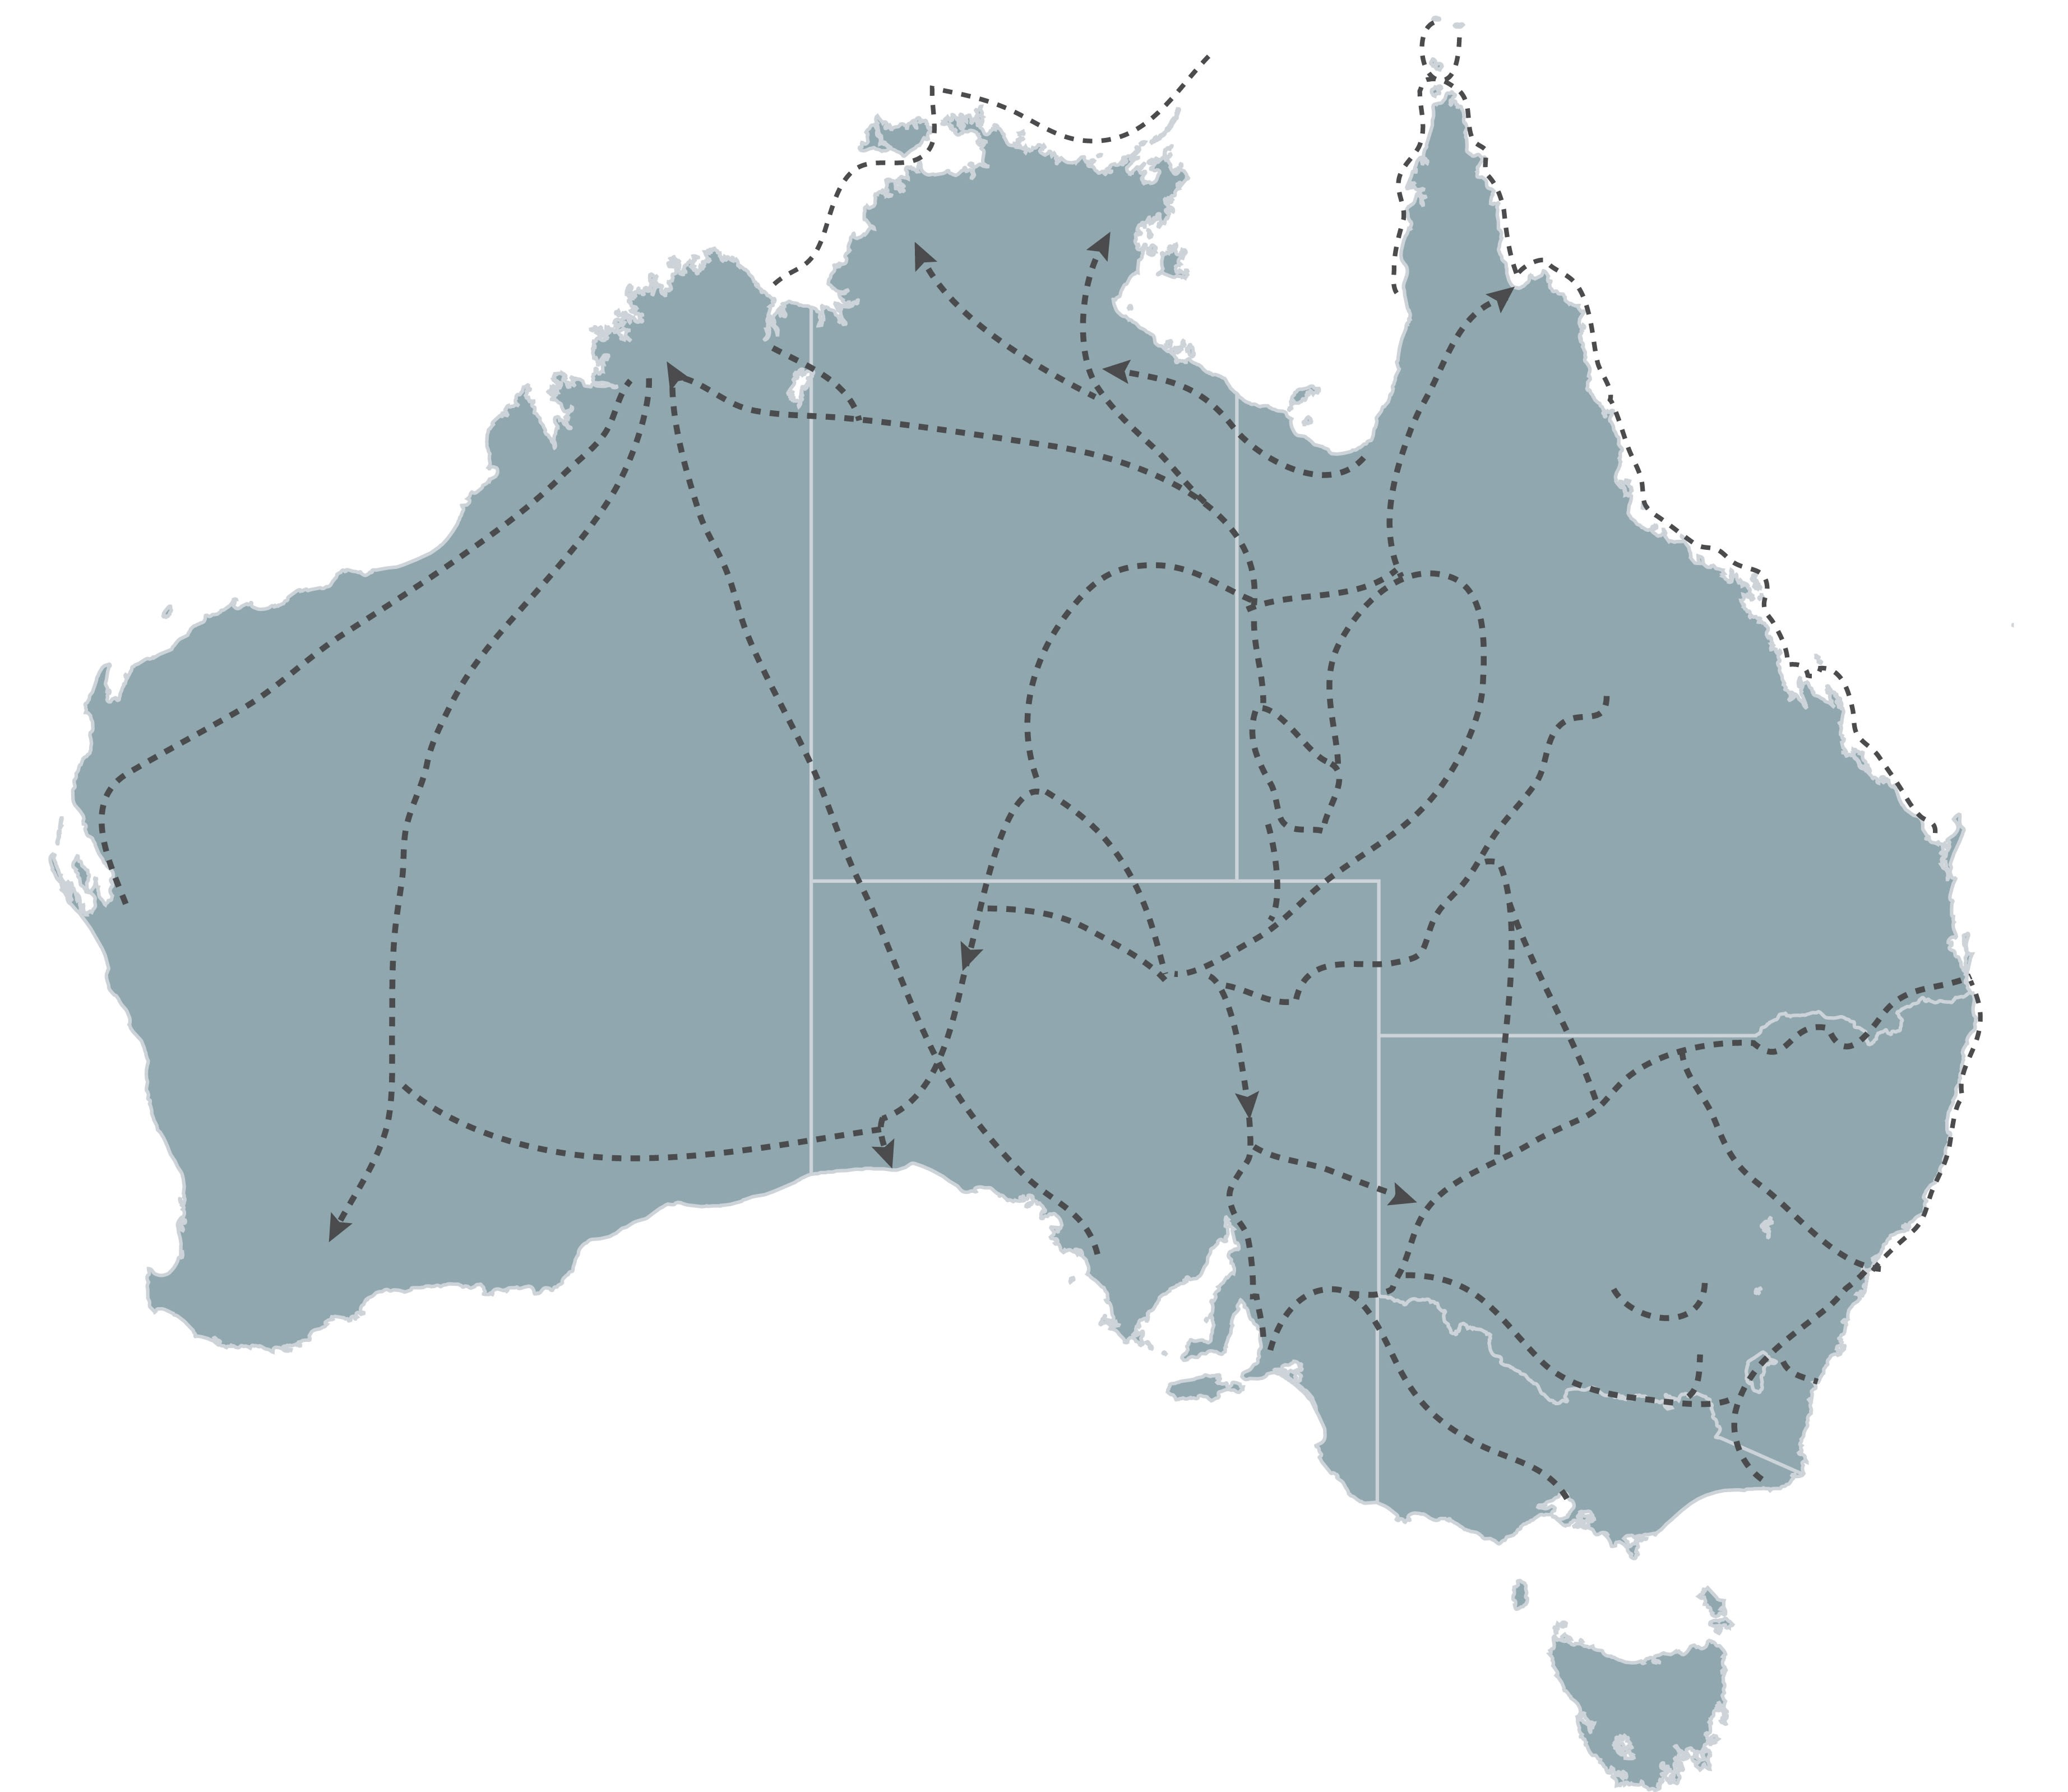 Aboriginal trading routes - map